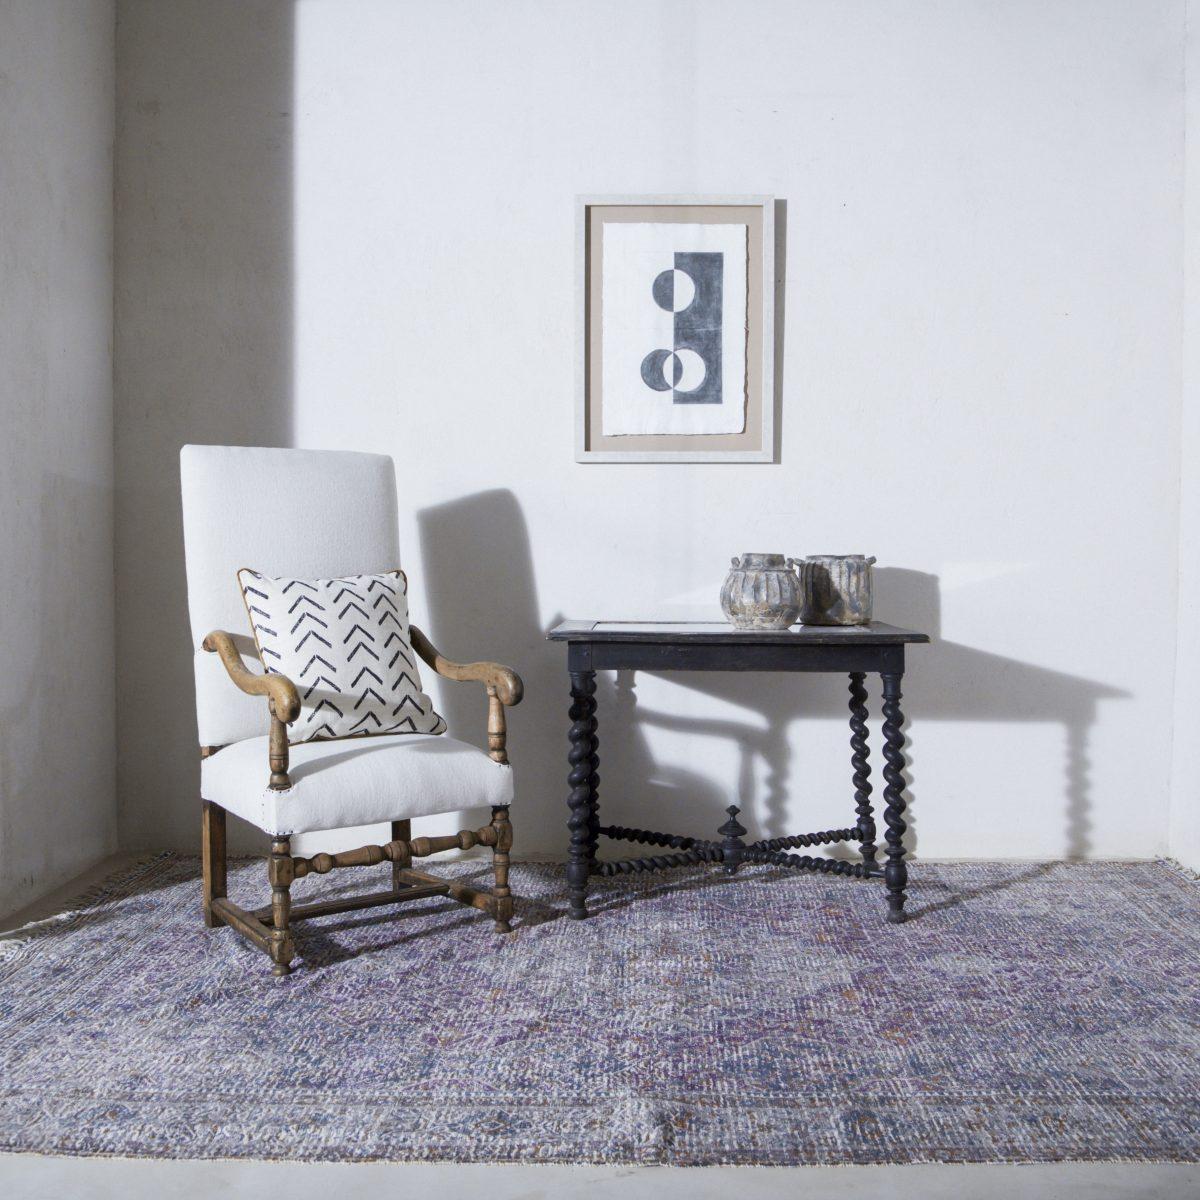 Butaca antigua de madera tapizada en lino beige